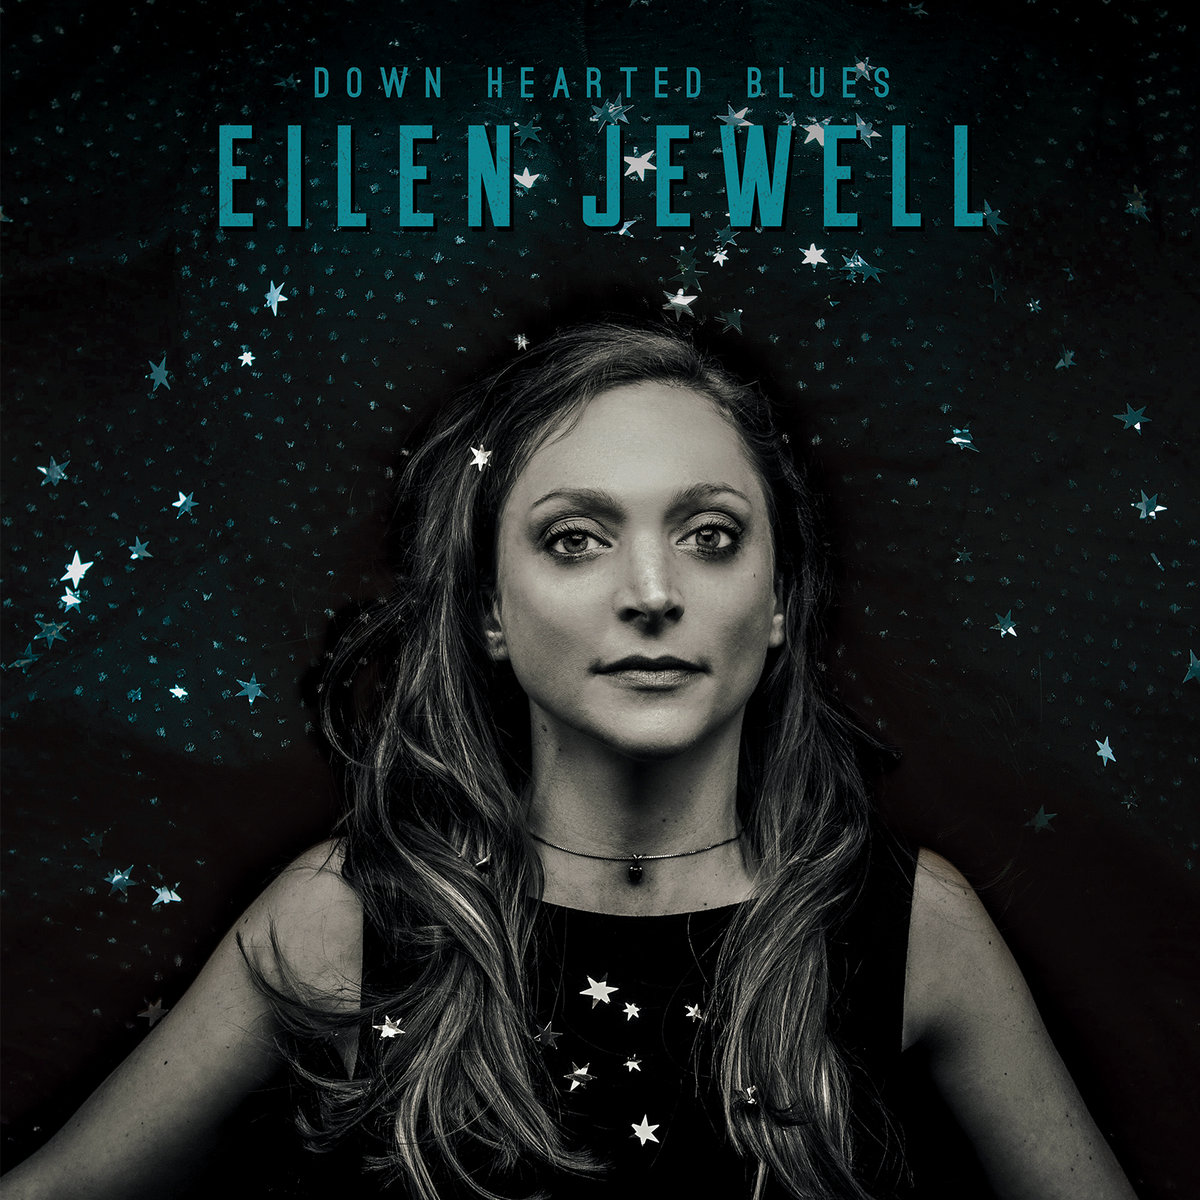 Eilen Jewell, Downhearted Blues - cover art